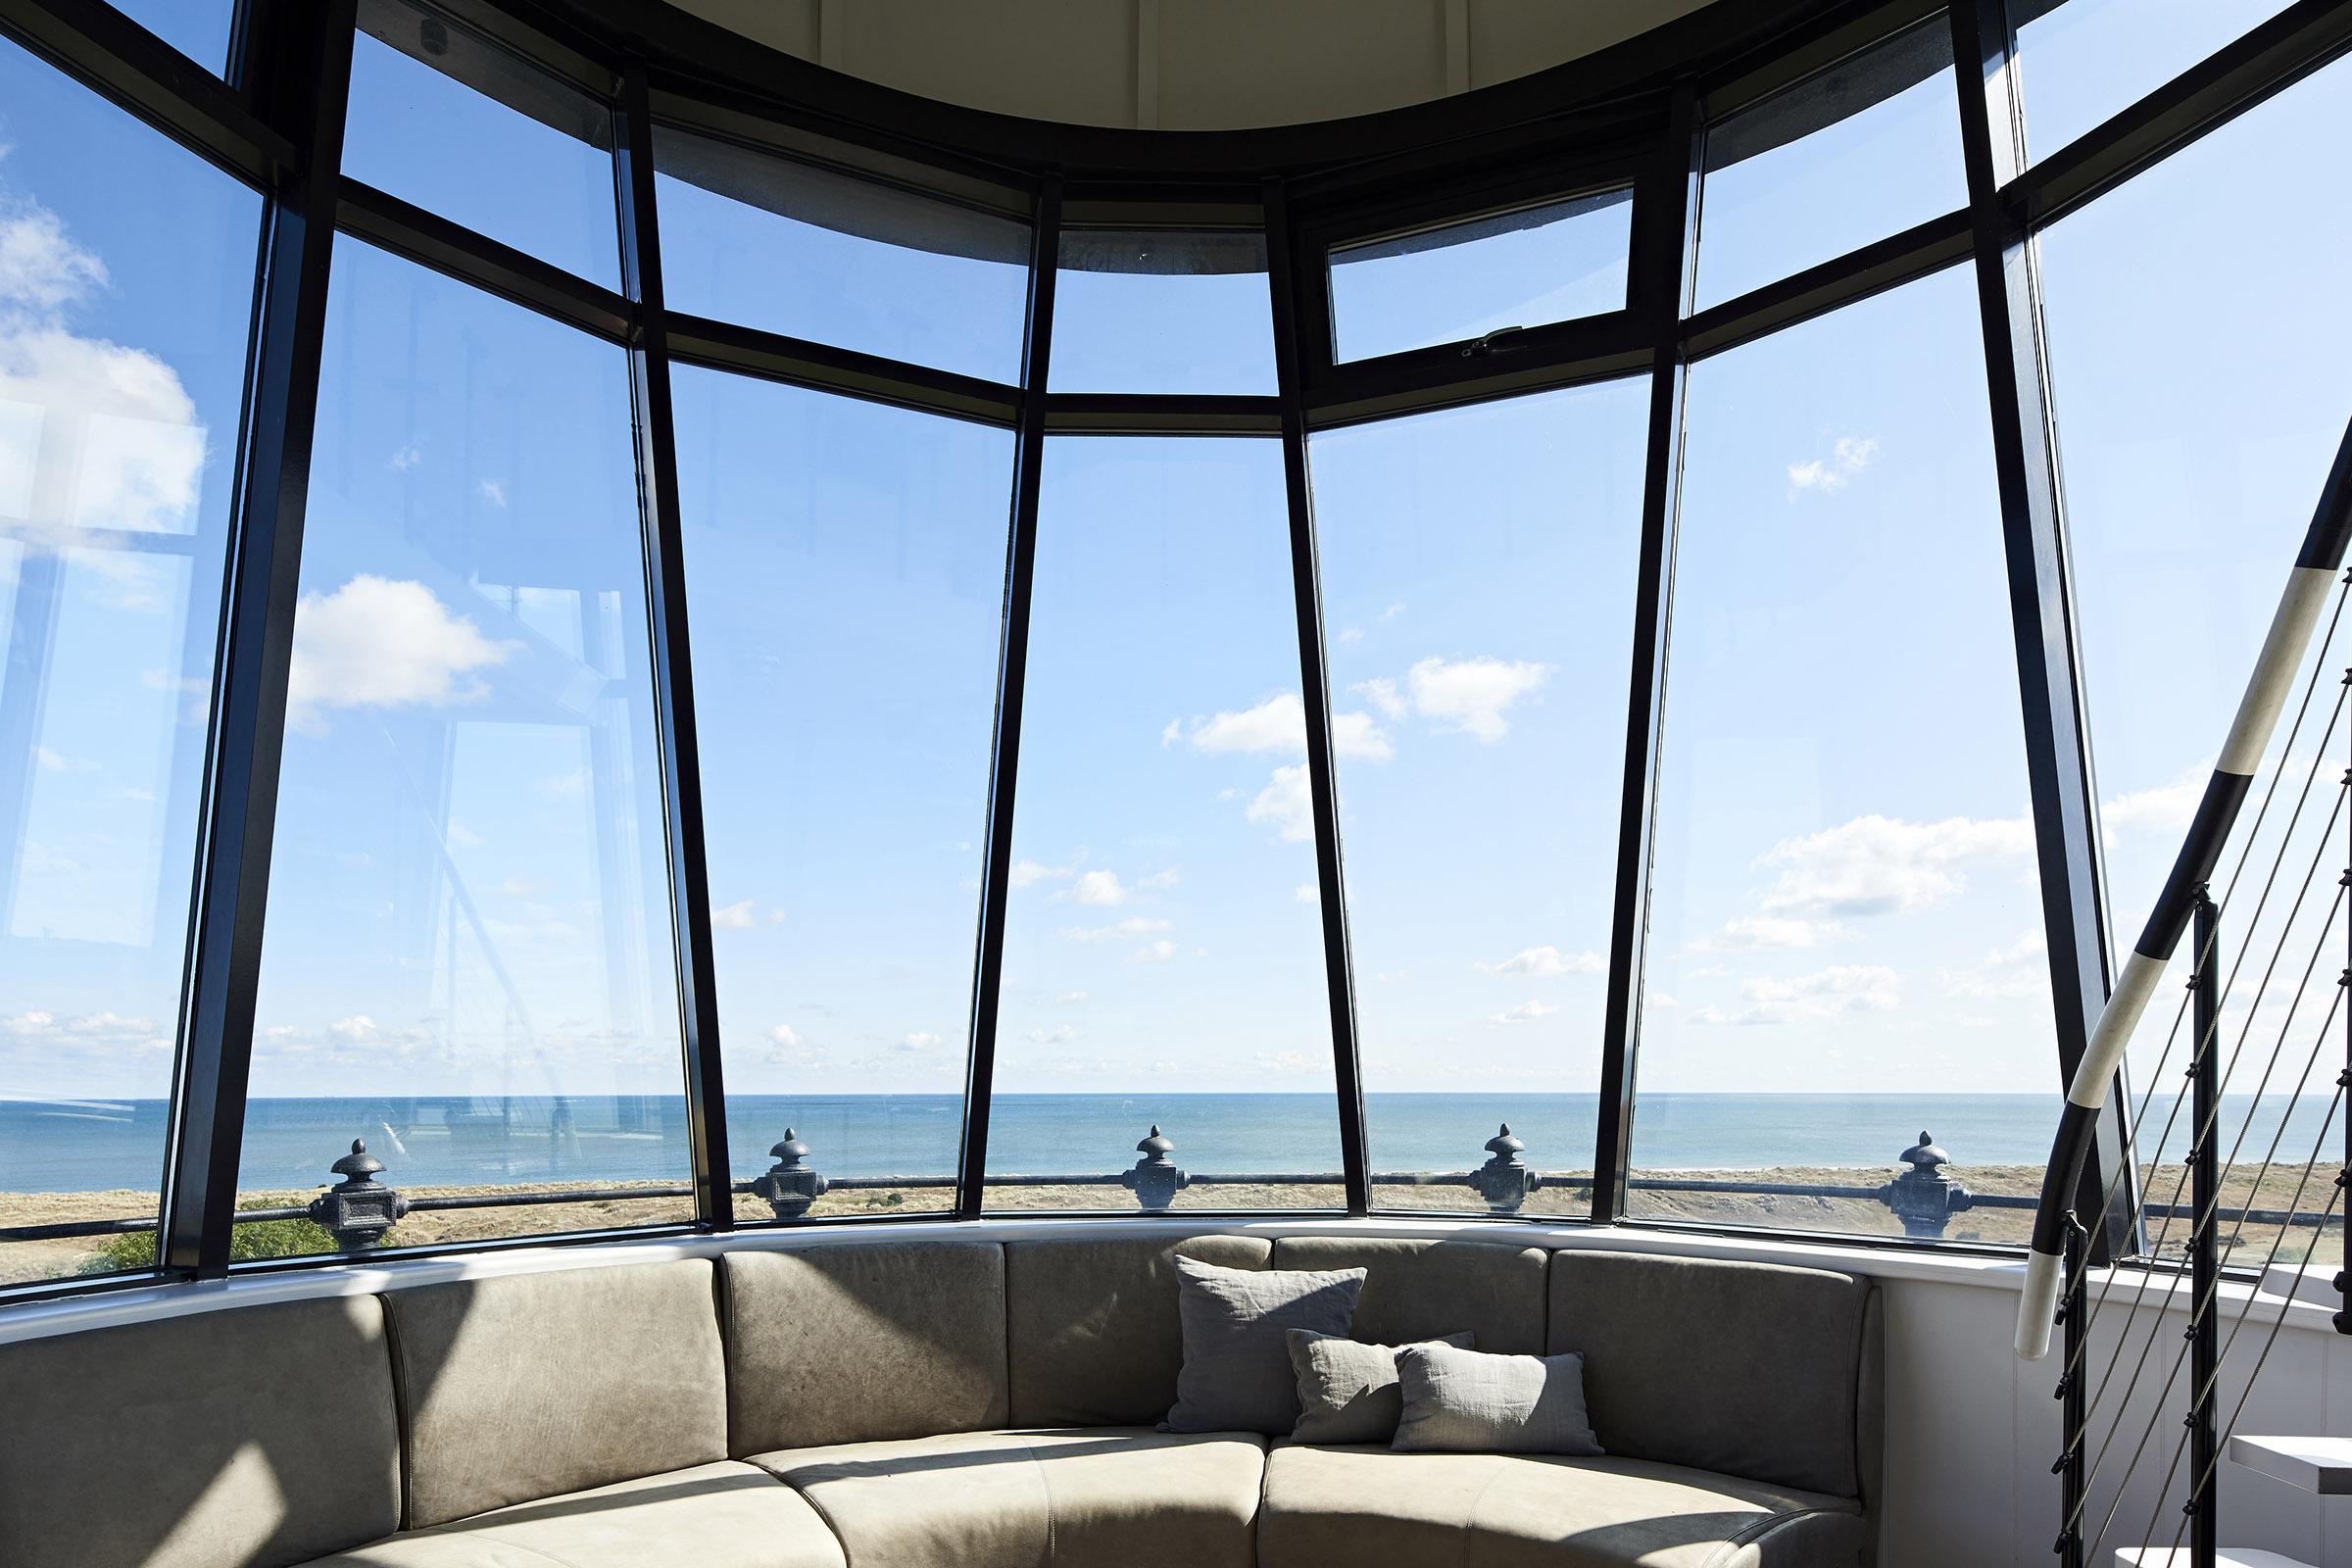 The Lantern Room overlooks the sea.